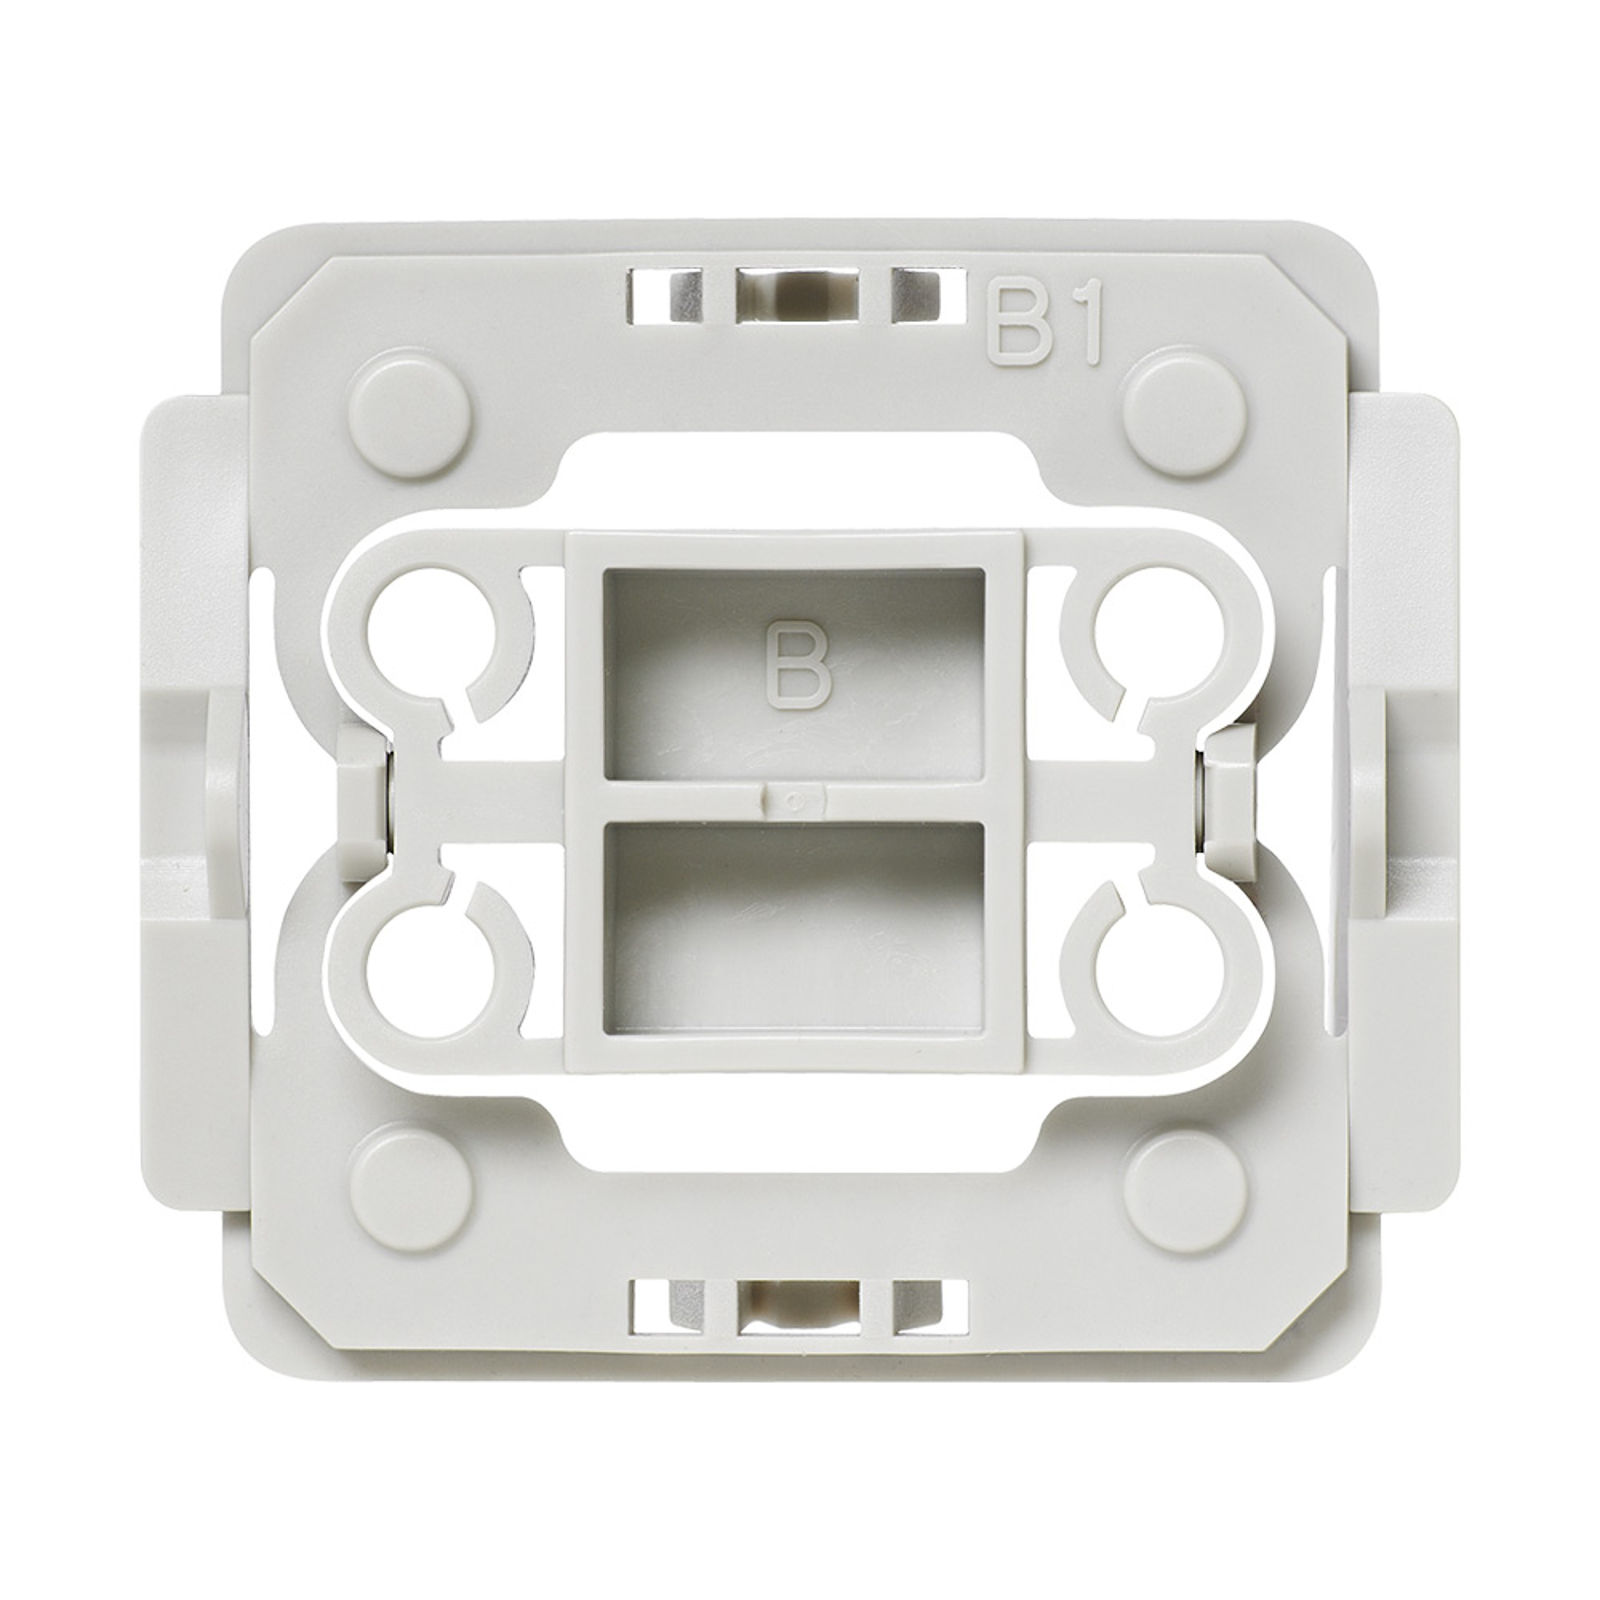 Homematic IP-adapter til Berker-kontakt B1 20x